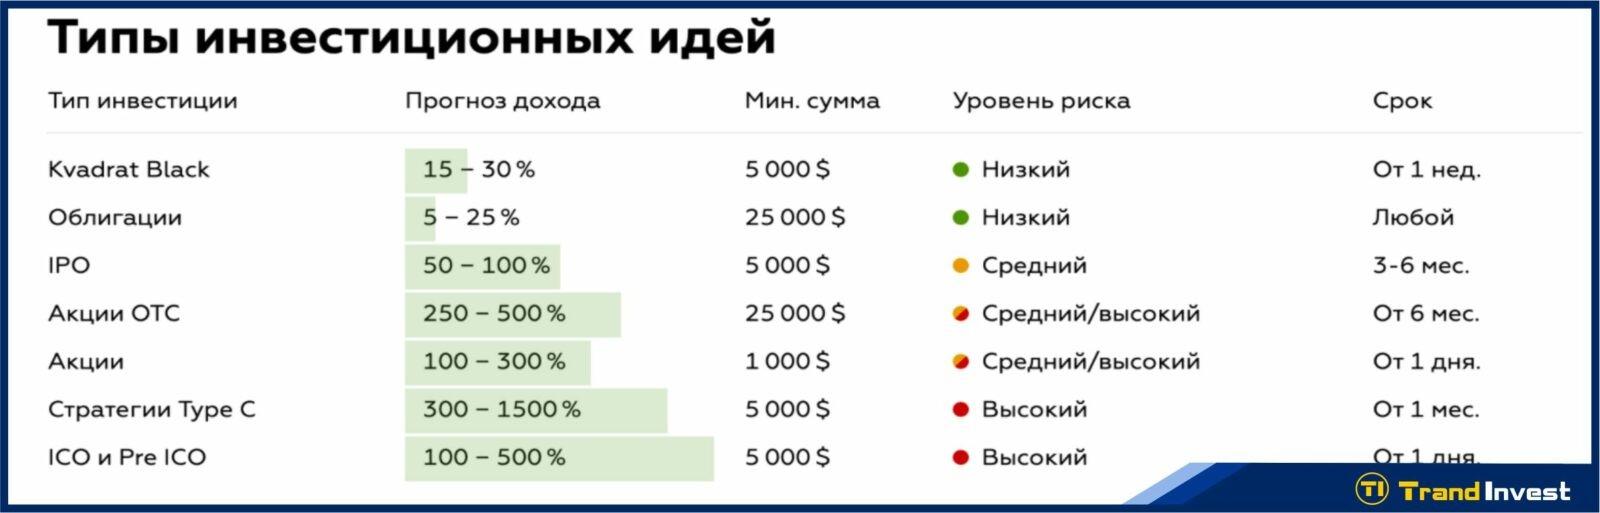 United Traders инвестиции